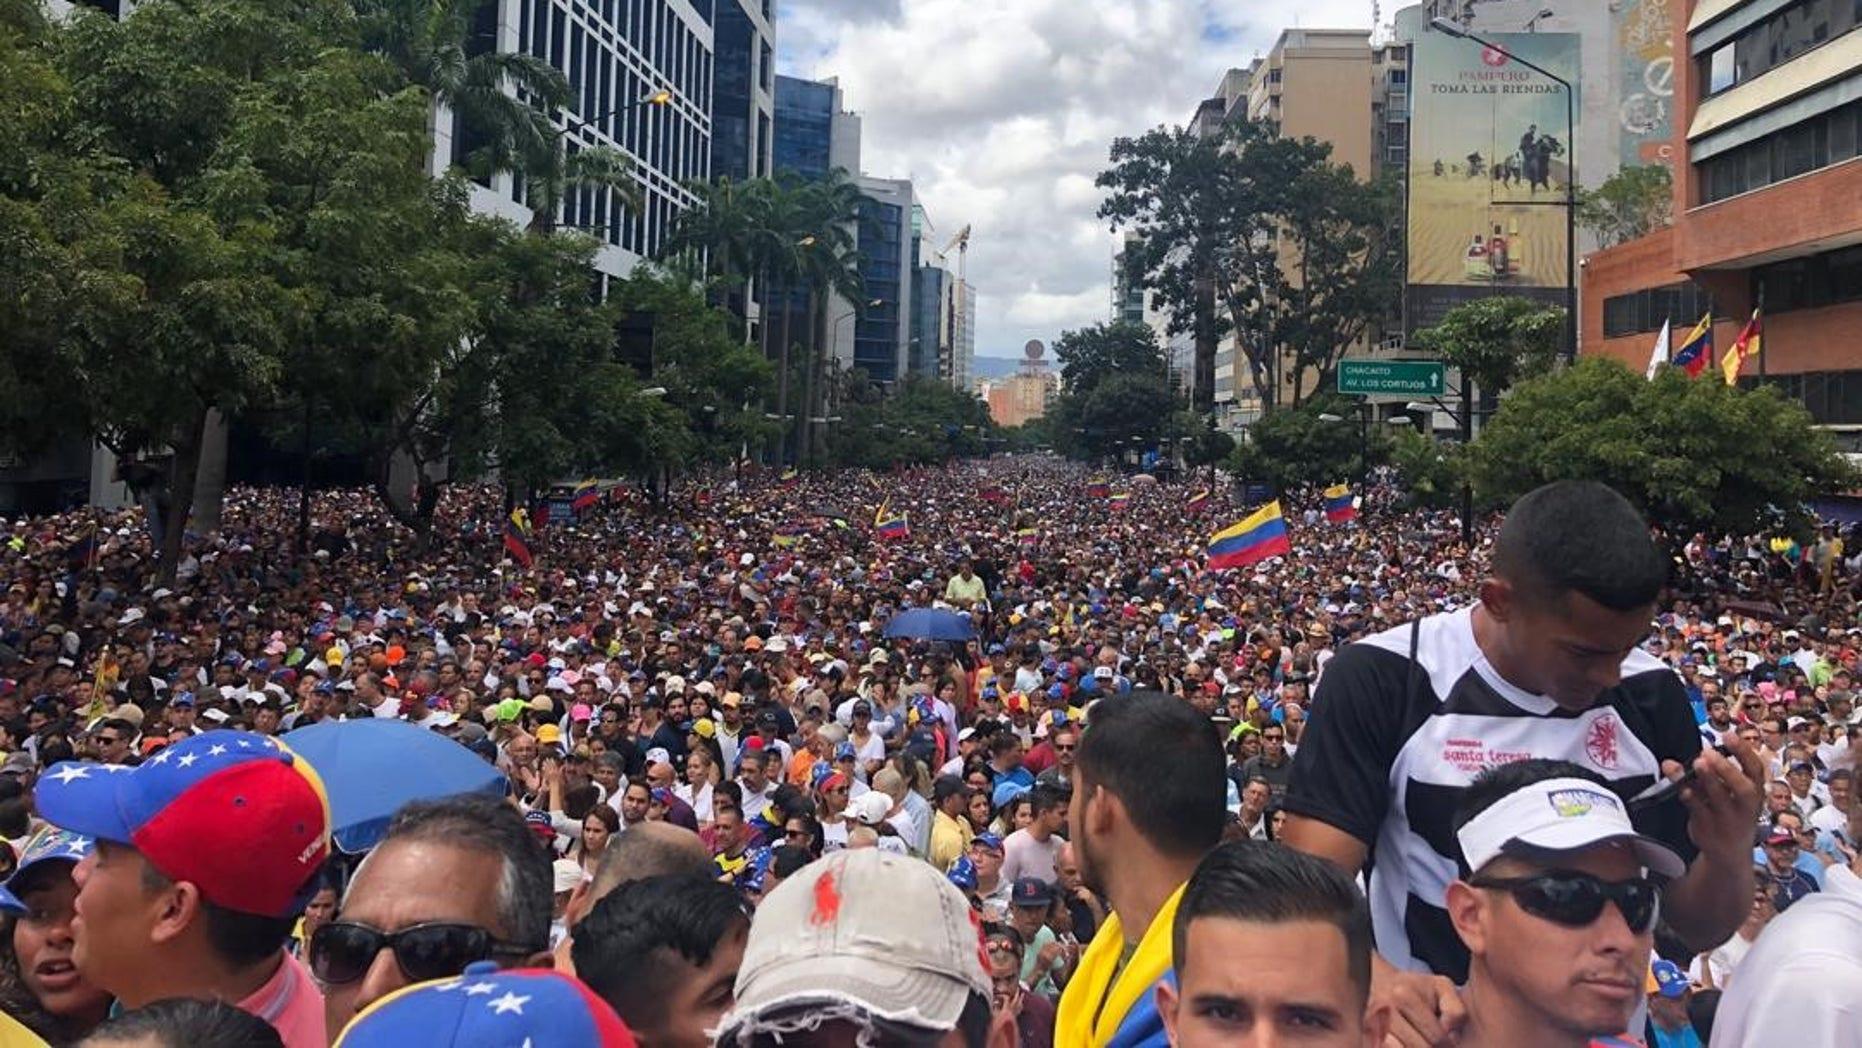 Protests against the Nicolas Maduro regime in Caracas, Venezuela on Wednesday, Jan 23 2019